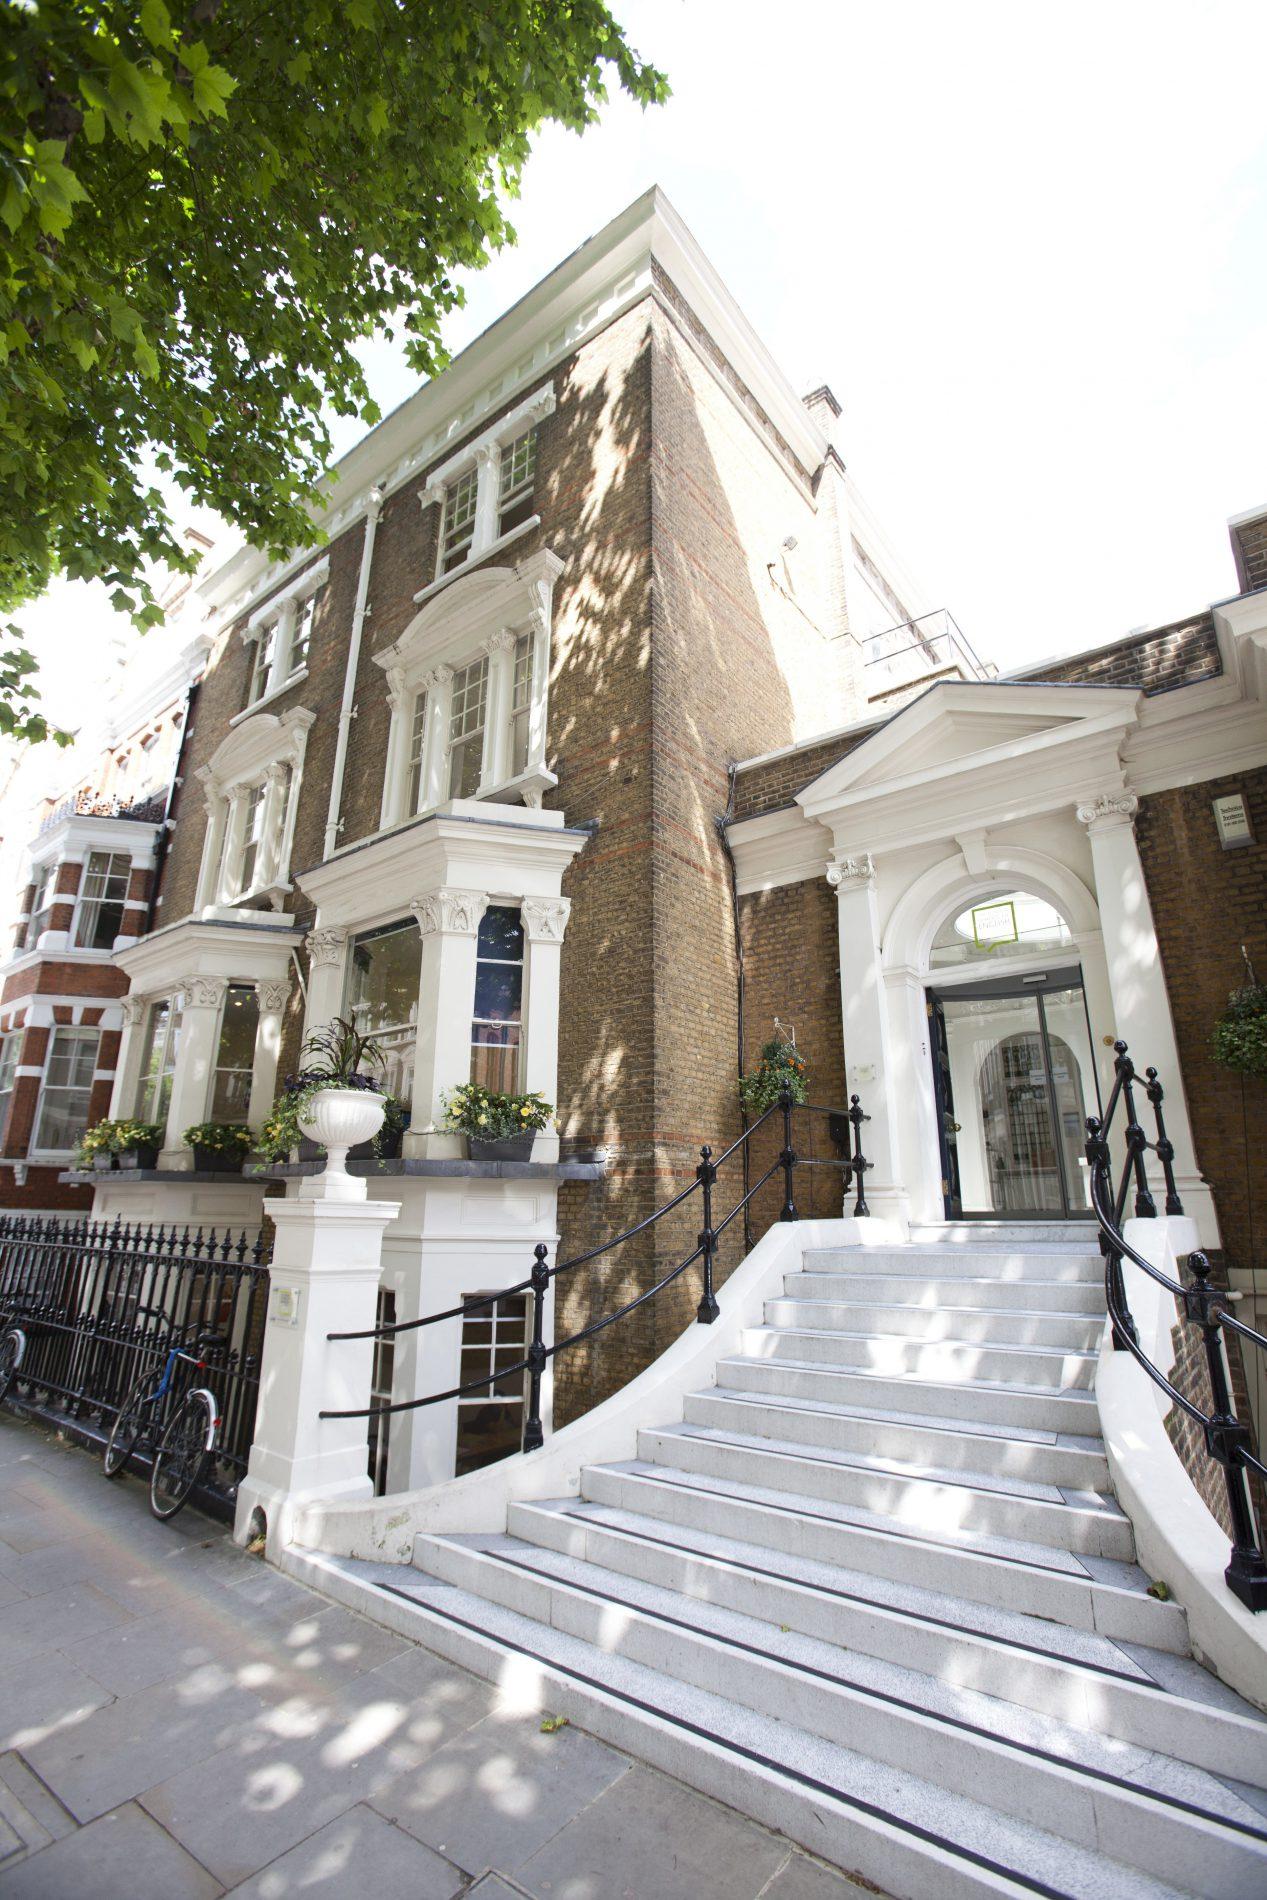 London school of english holland park pepa ferrer for London school of english